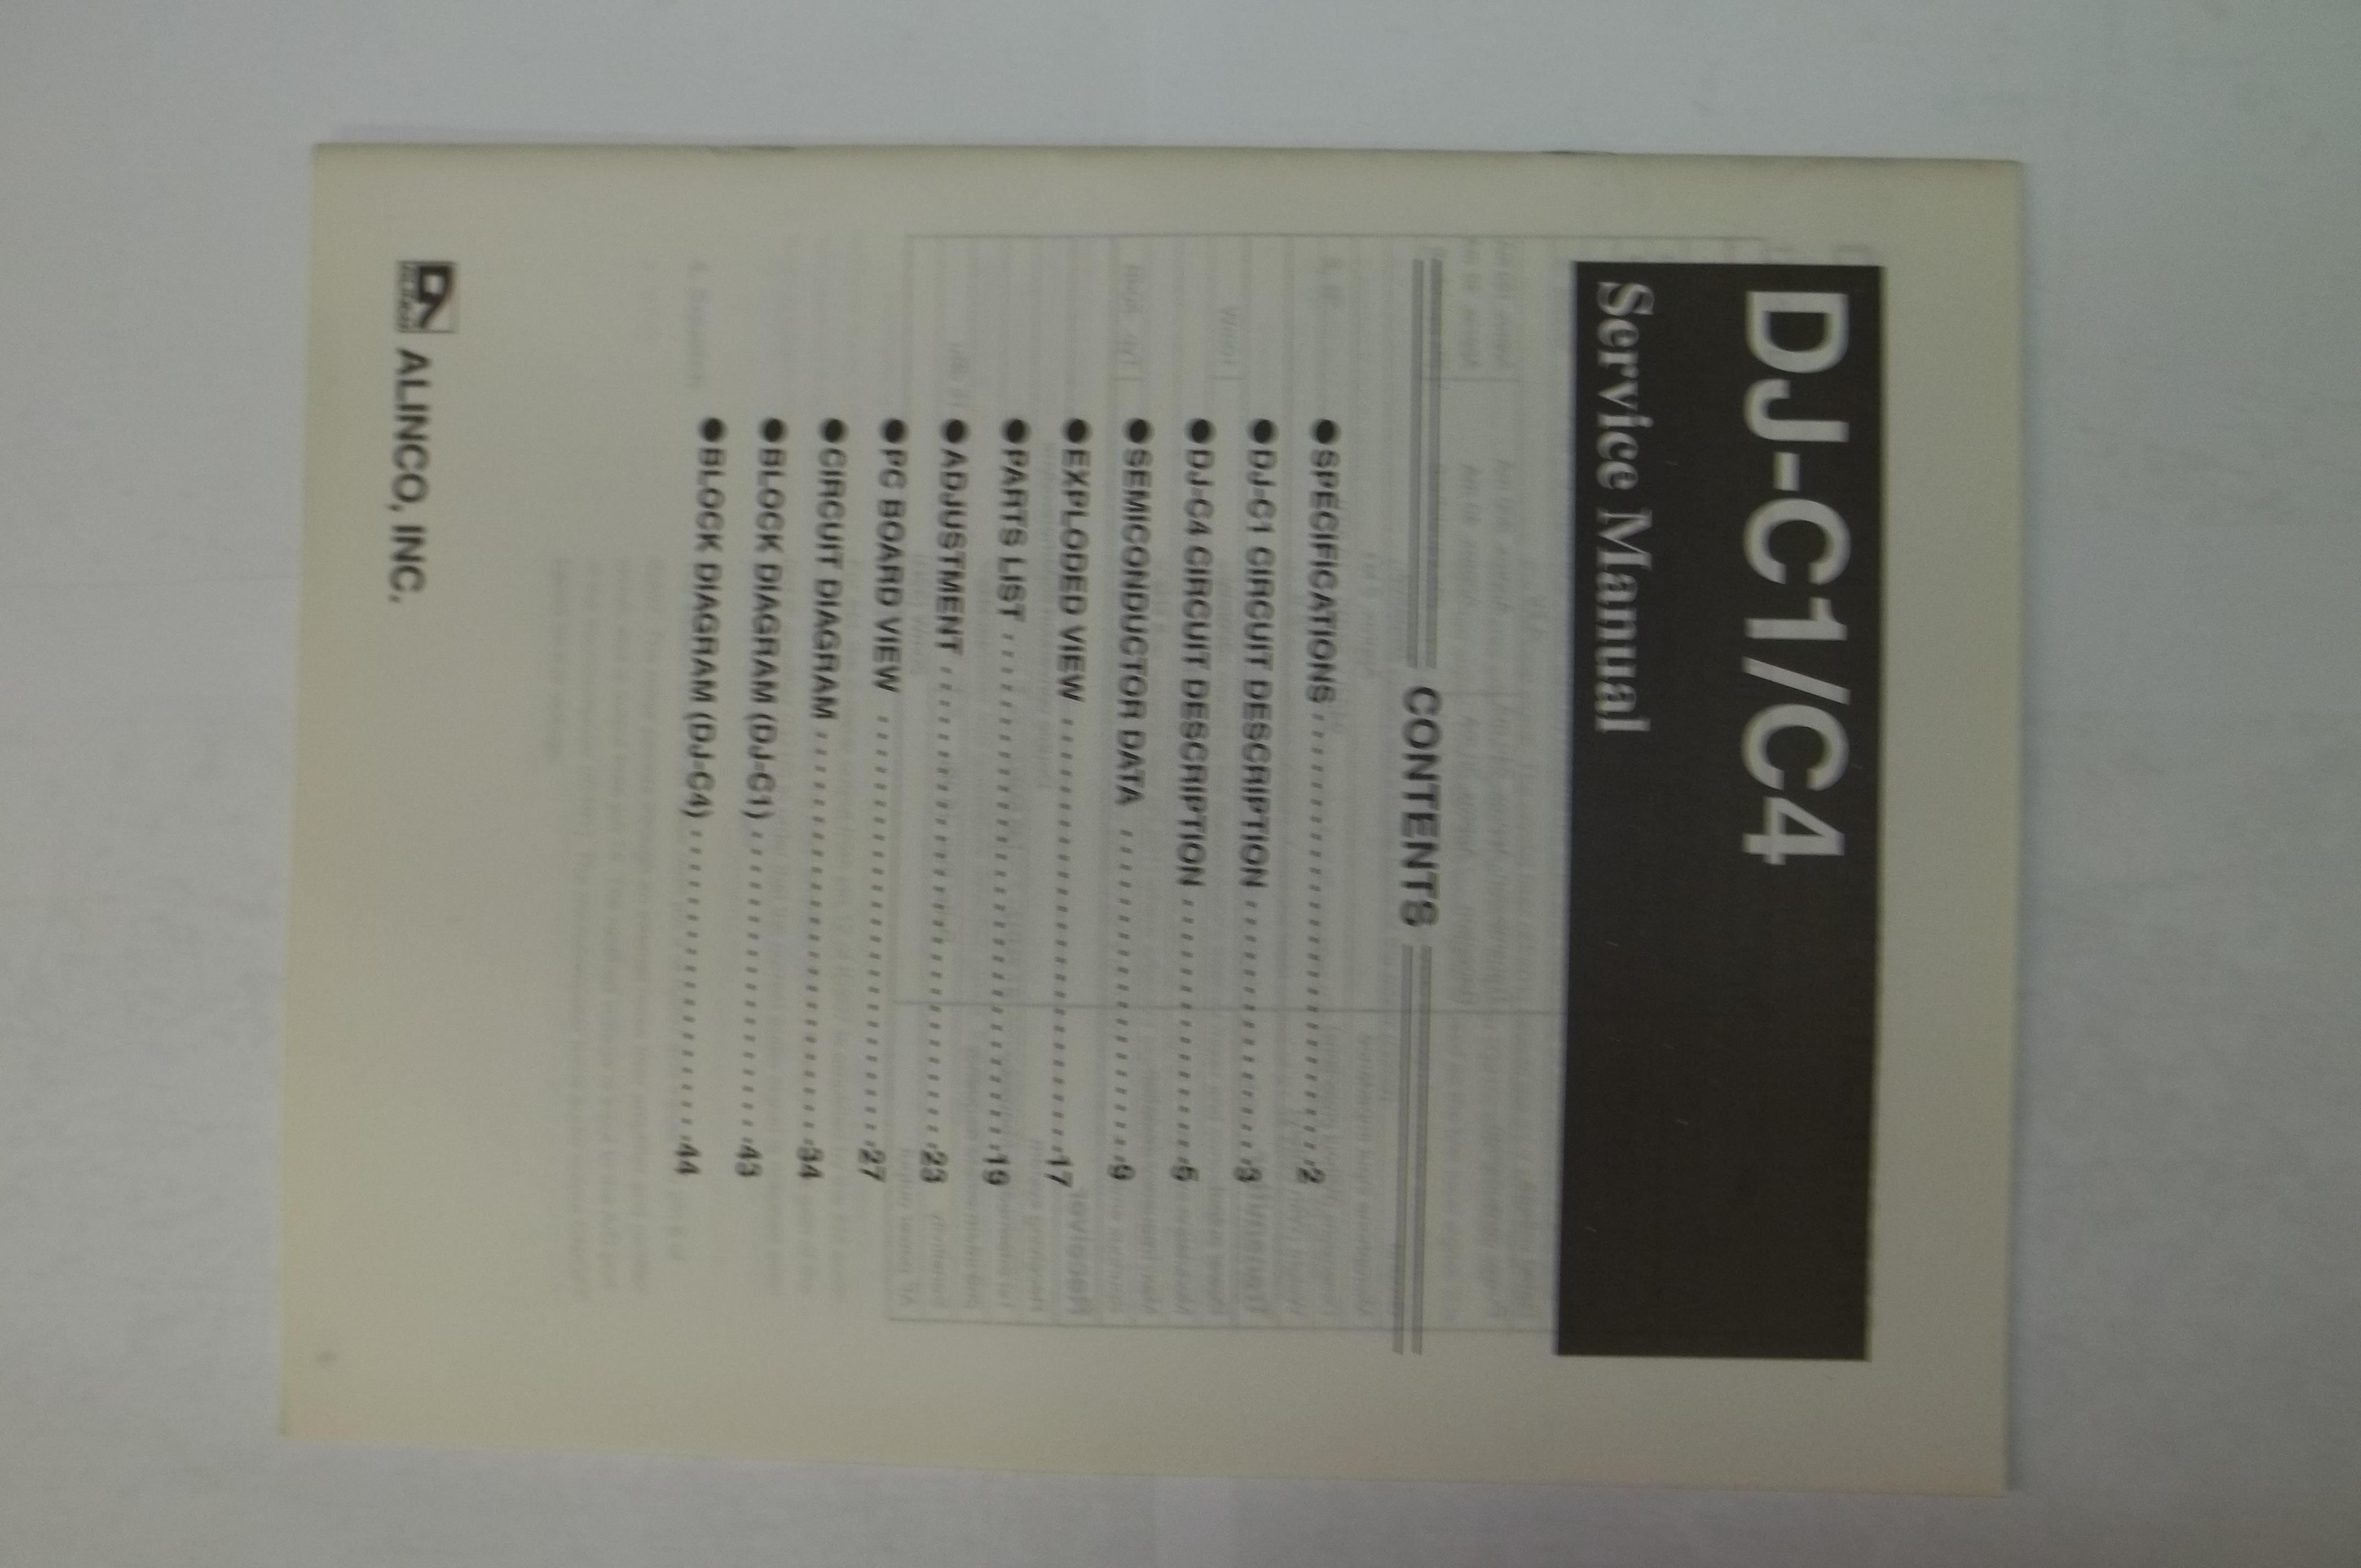 Rl Electronics Alinco Battery Rack Alpha Wiring Diagram Djc1tsm